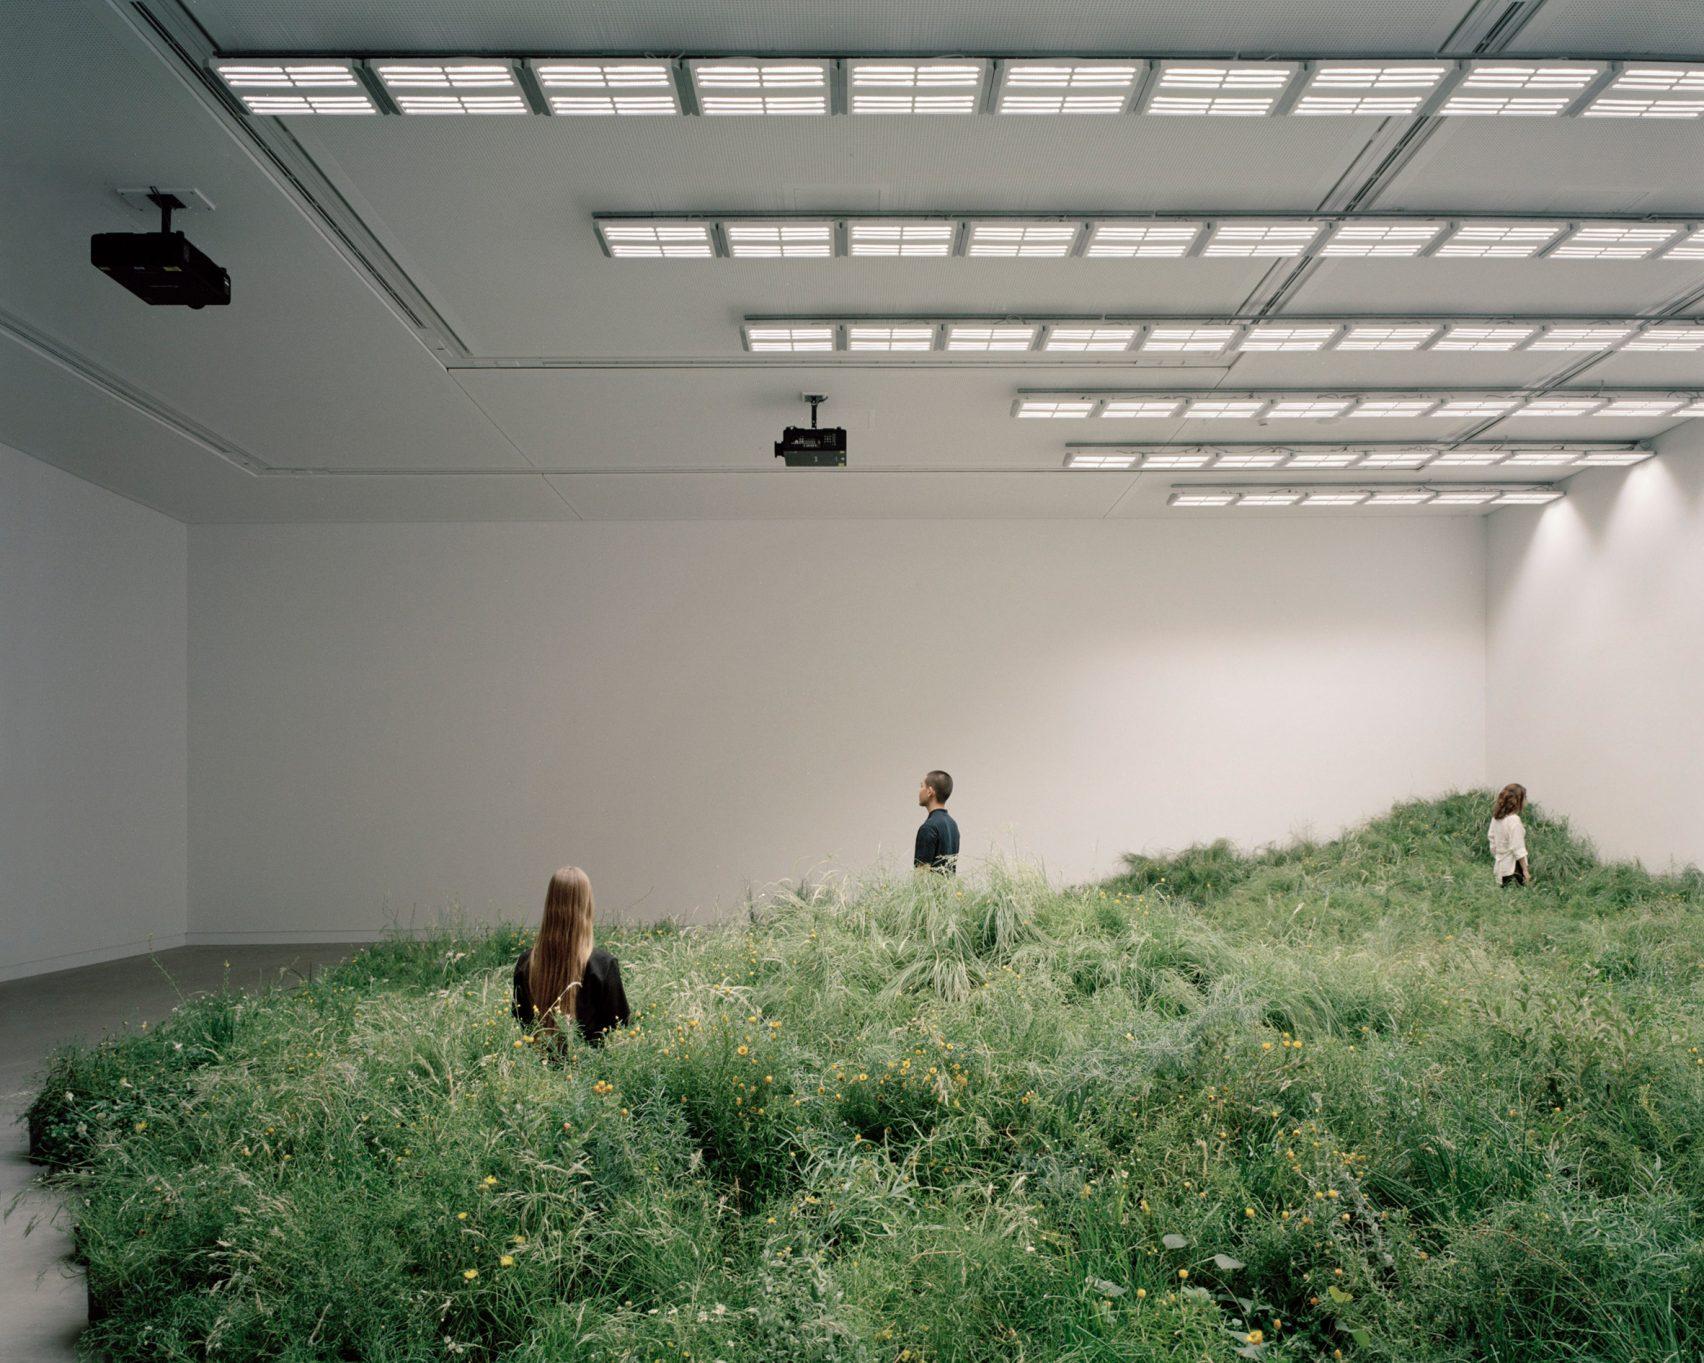 Grasslands-Repair-Pabellon-Australia-Venecia-Baracco-Wright-Rory-Gardiner-PRINCIPAL